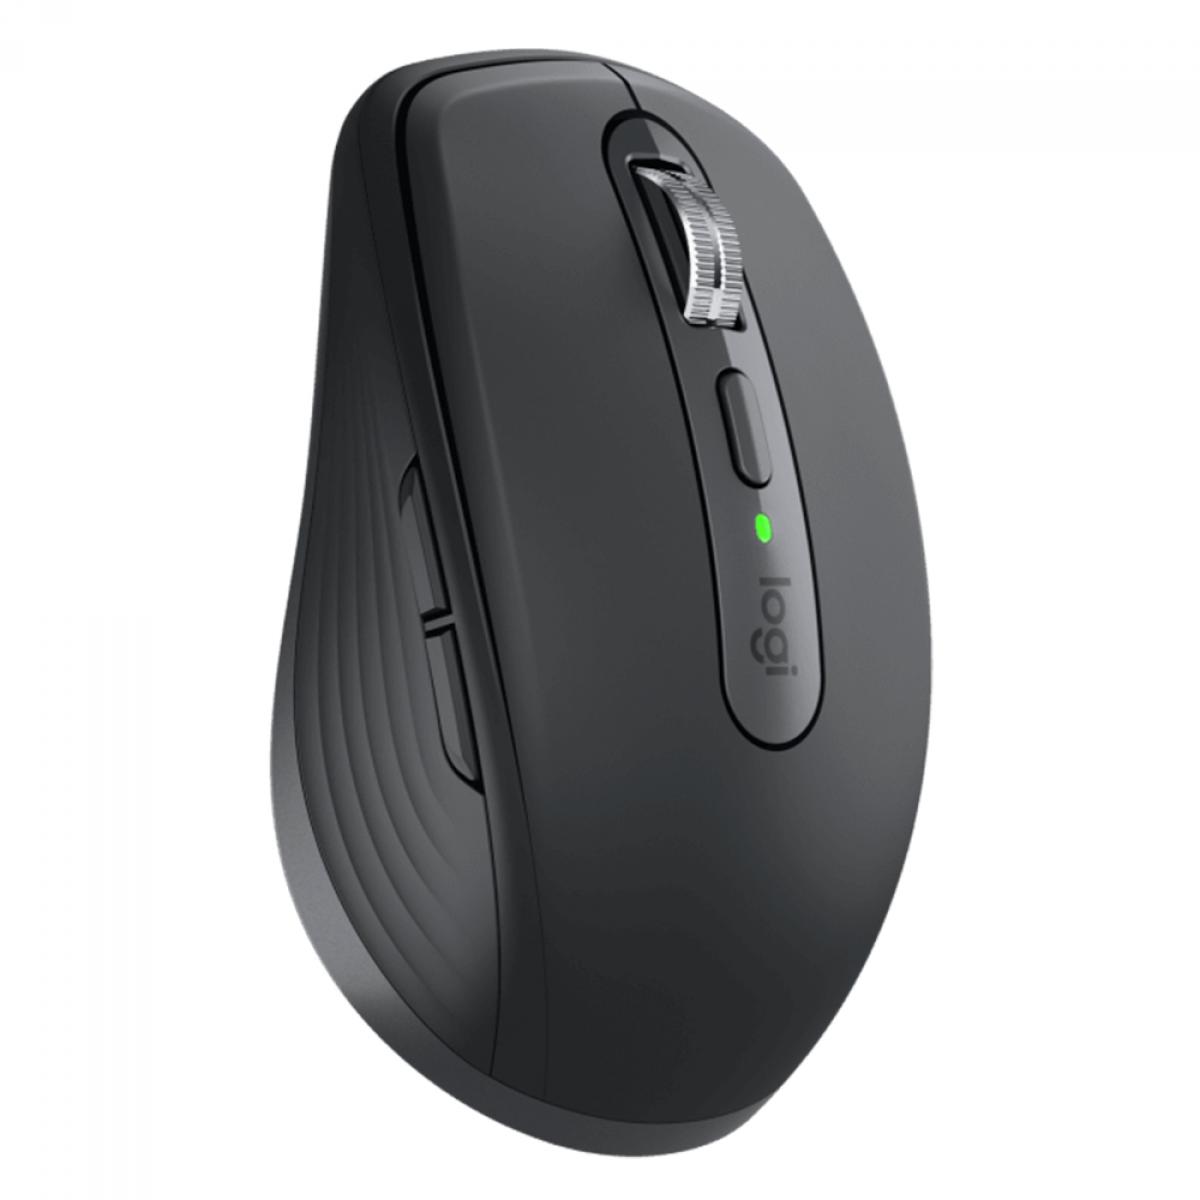 Mouse Logitech MX Anywhere 3 Wireless, 4000 DPI, 6 Botões, Gray, 910-005992